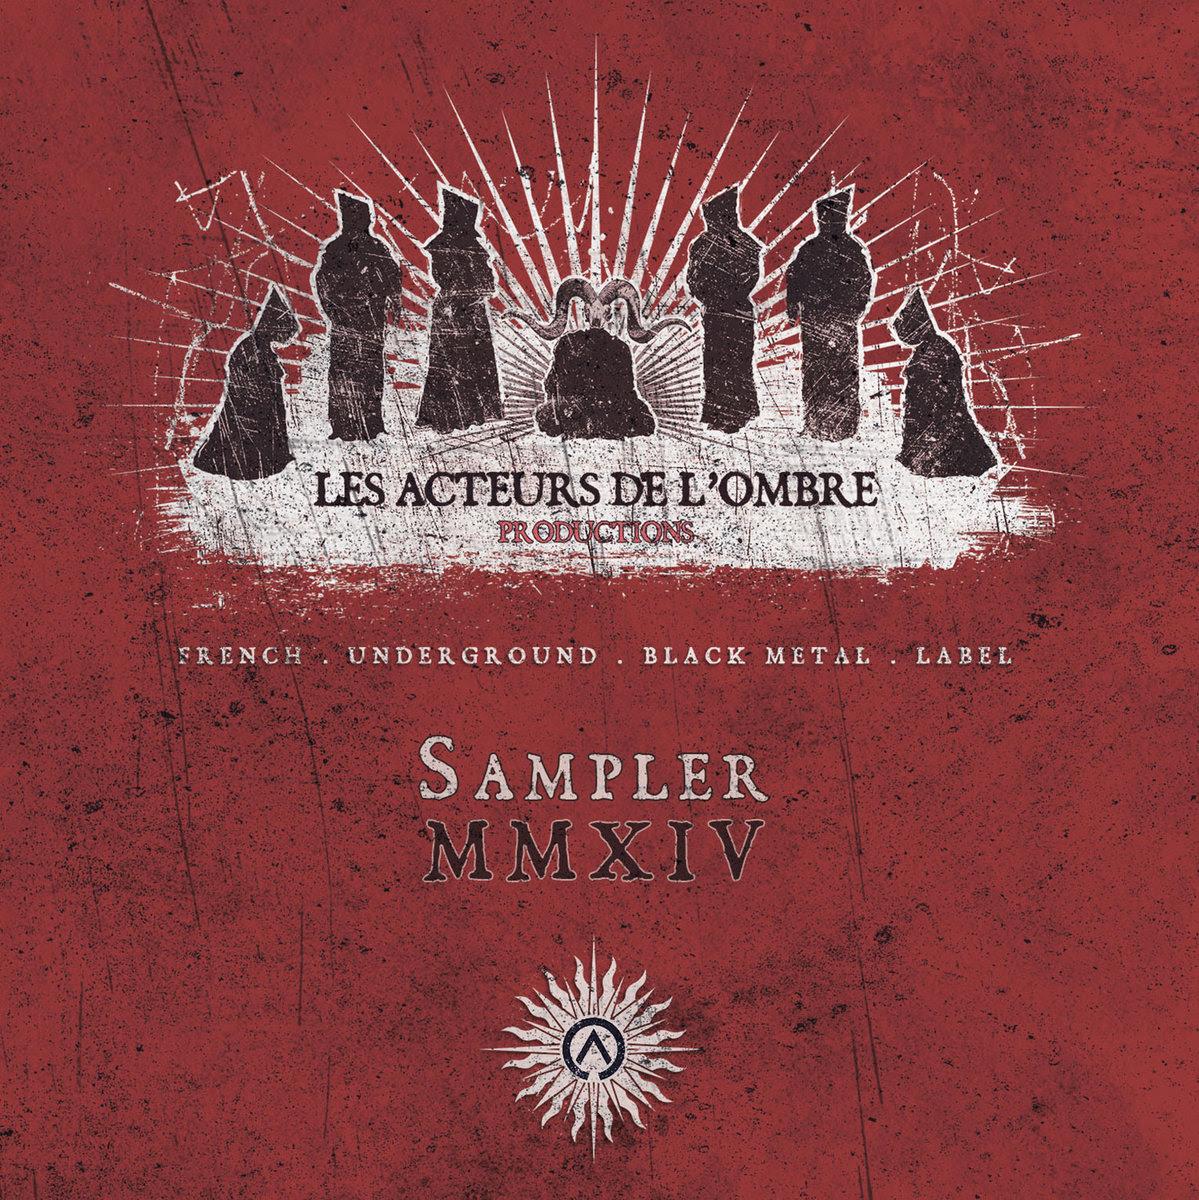 Les Acteurs de l'Ombre Productions - Sampler MMXIV